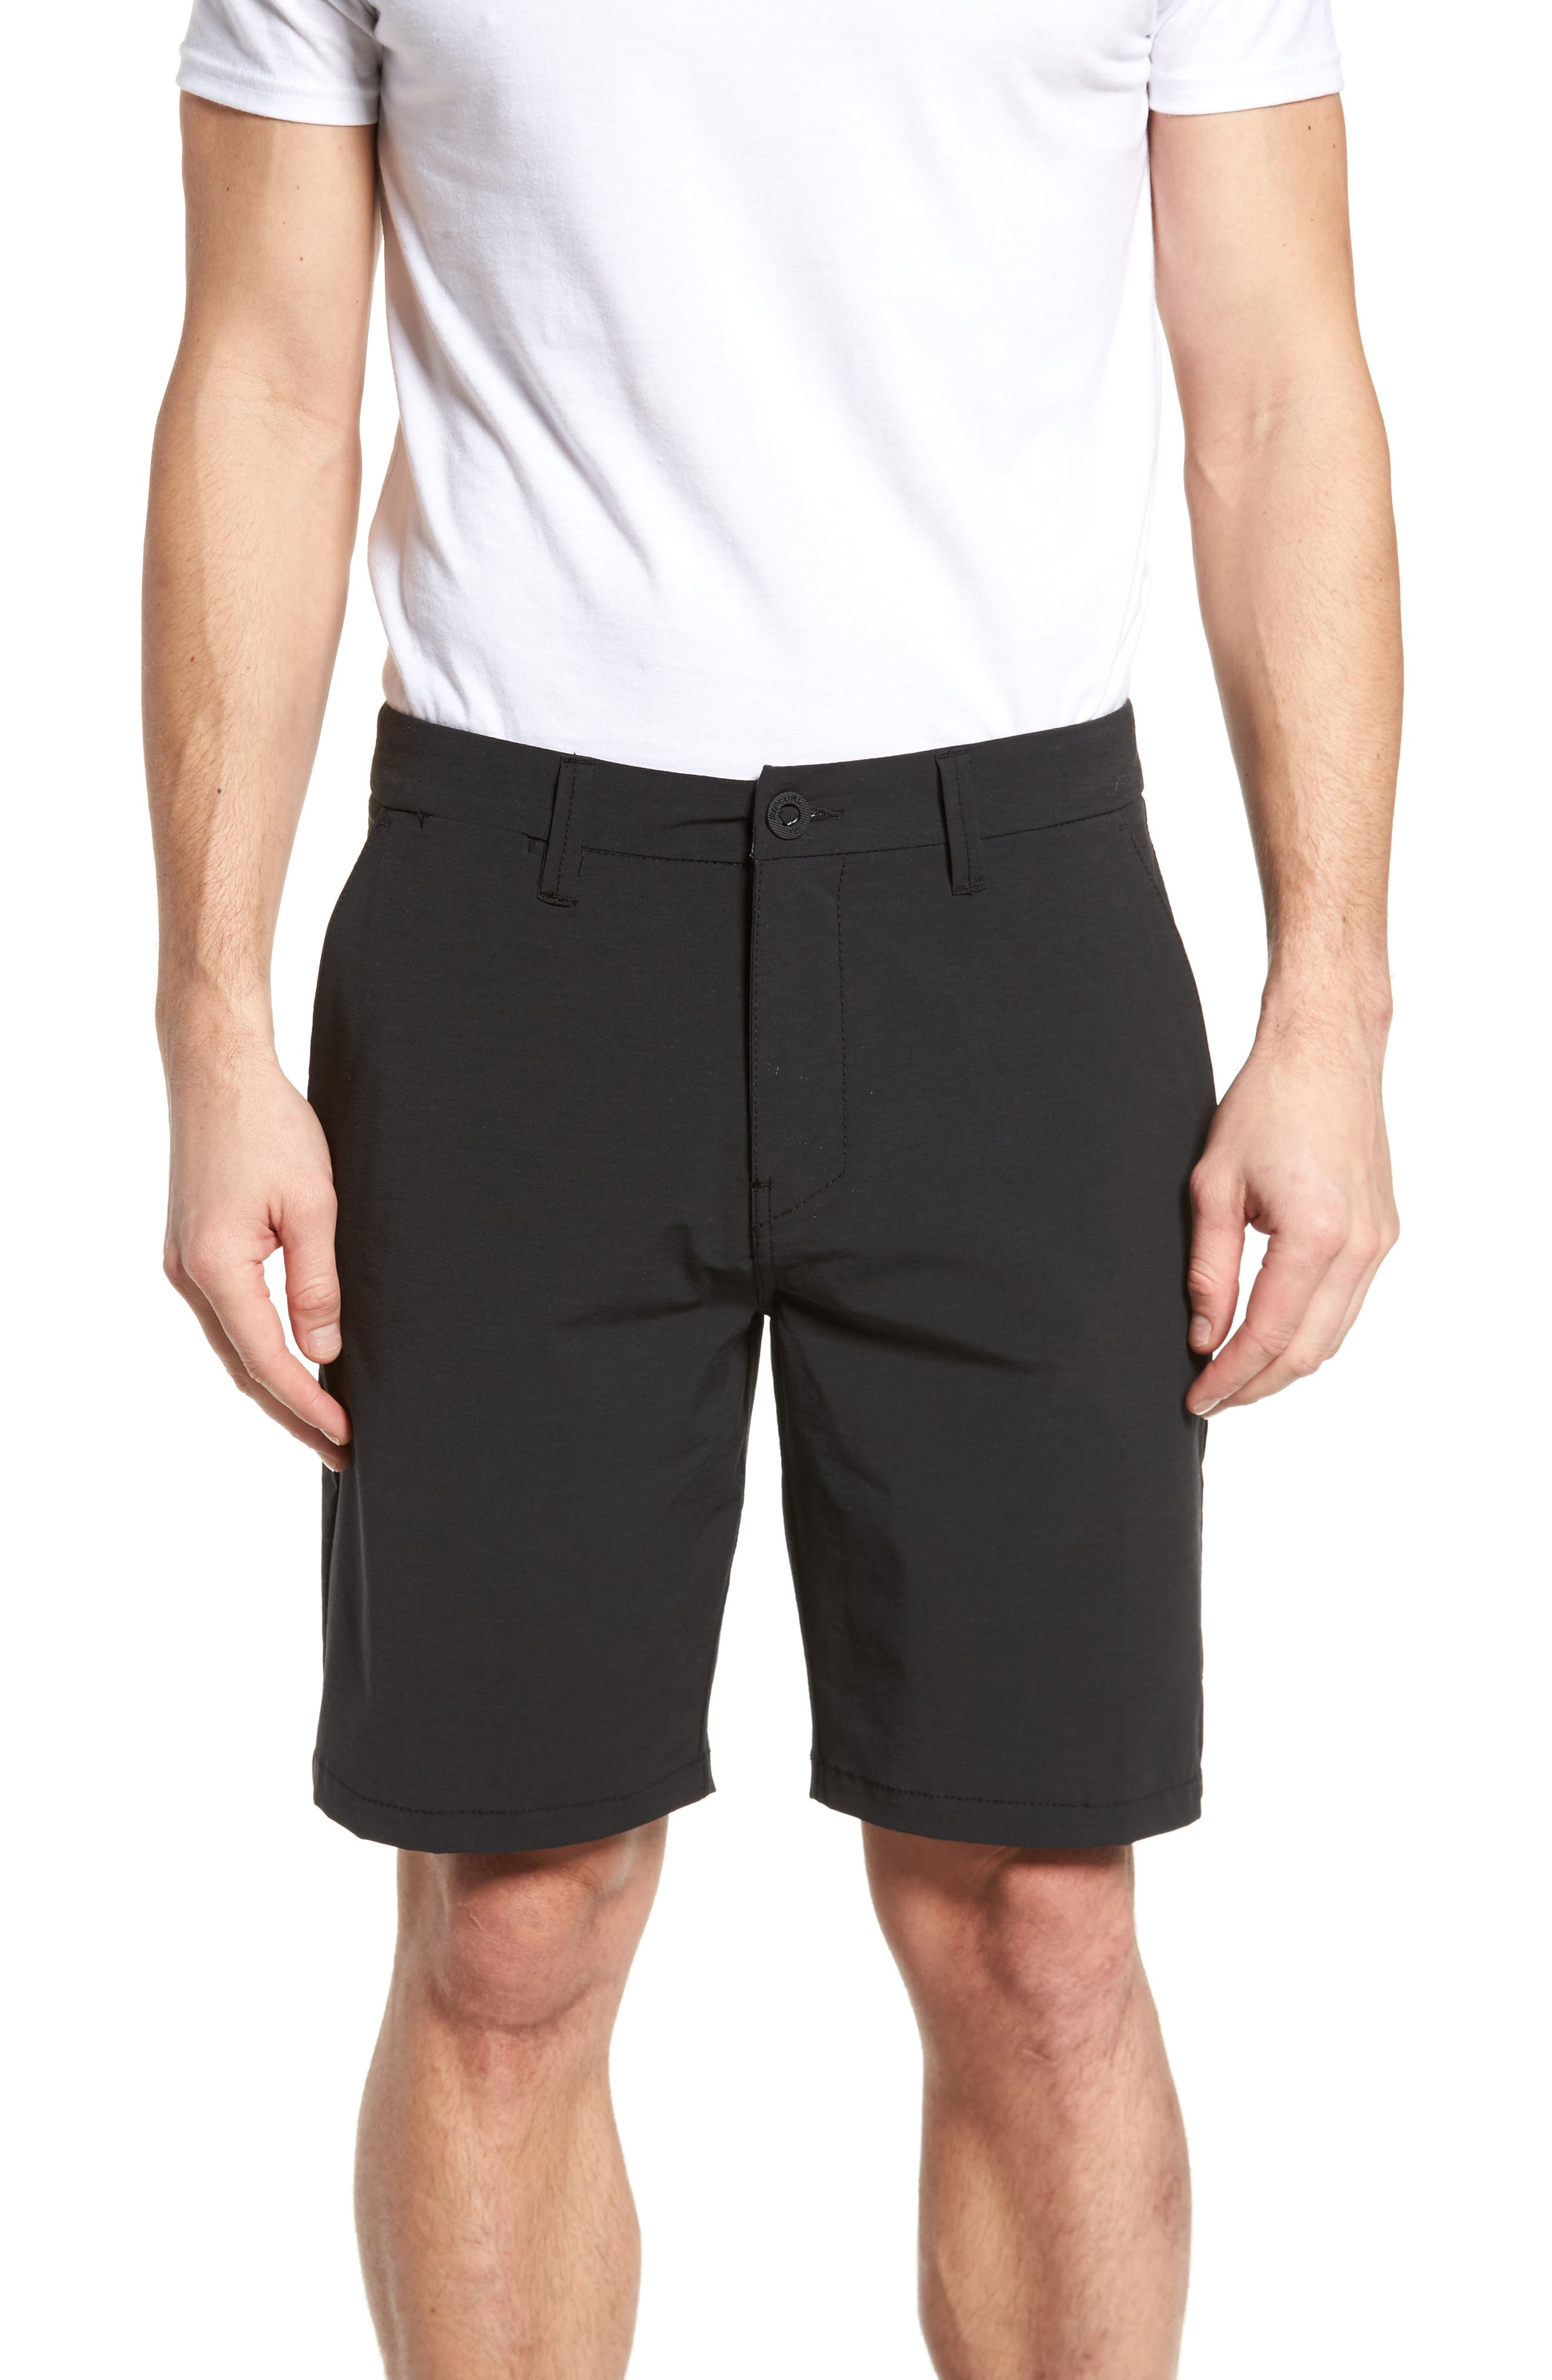 Mirage Records Boardwalk Shorts,                         Main,                         color, 010